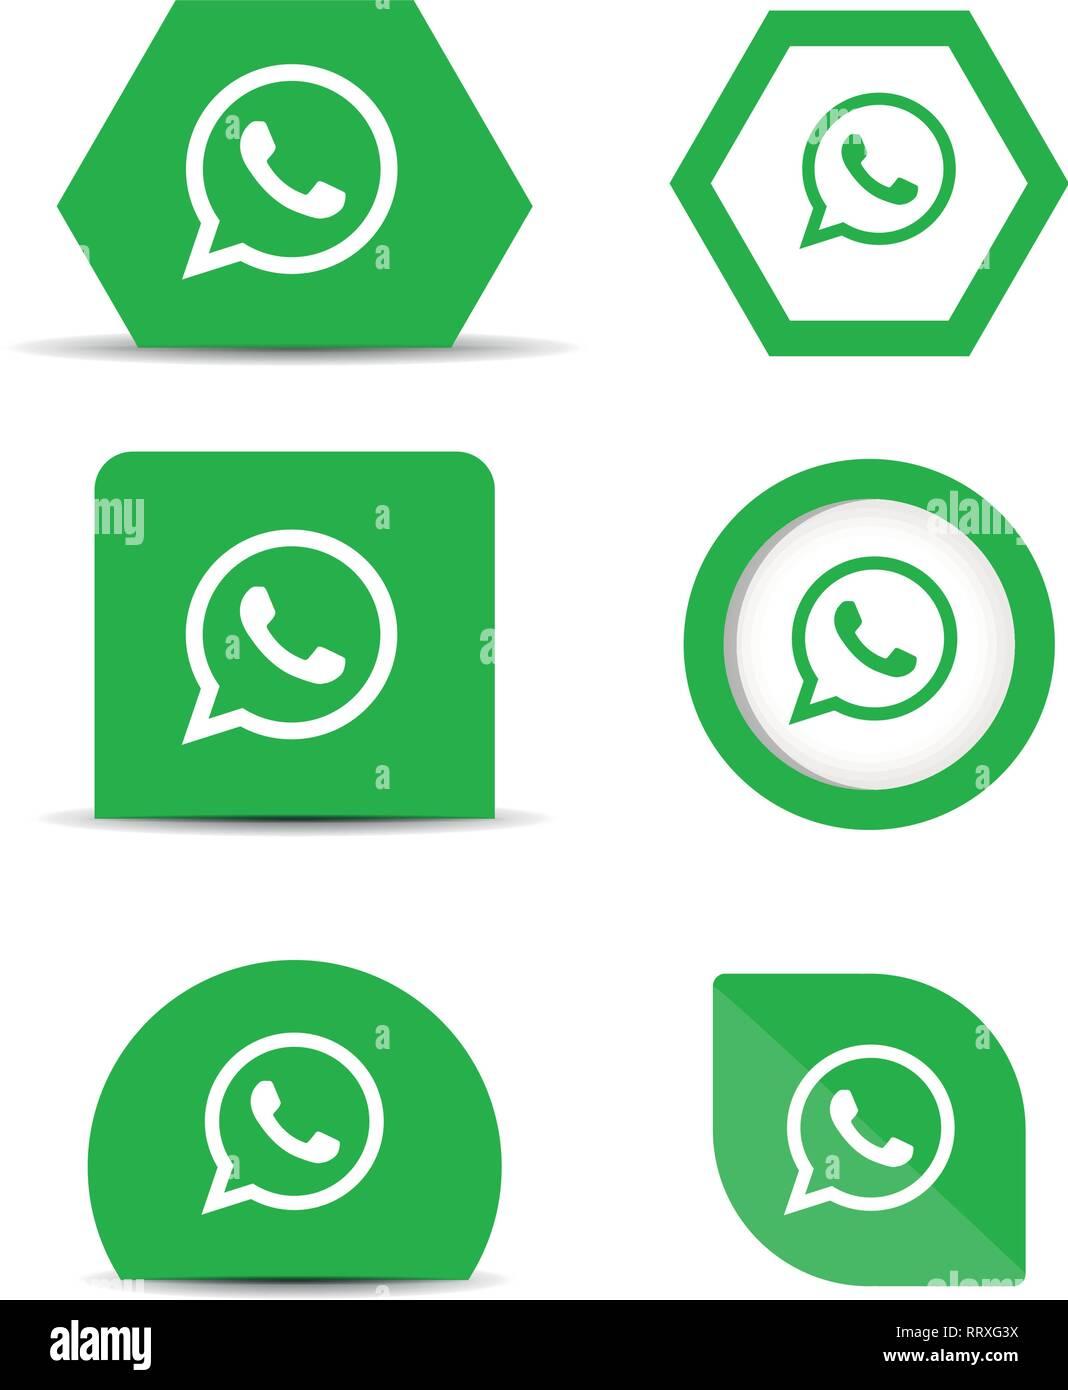 App whats WhatsApp Messenger